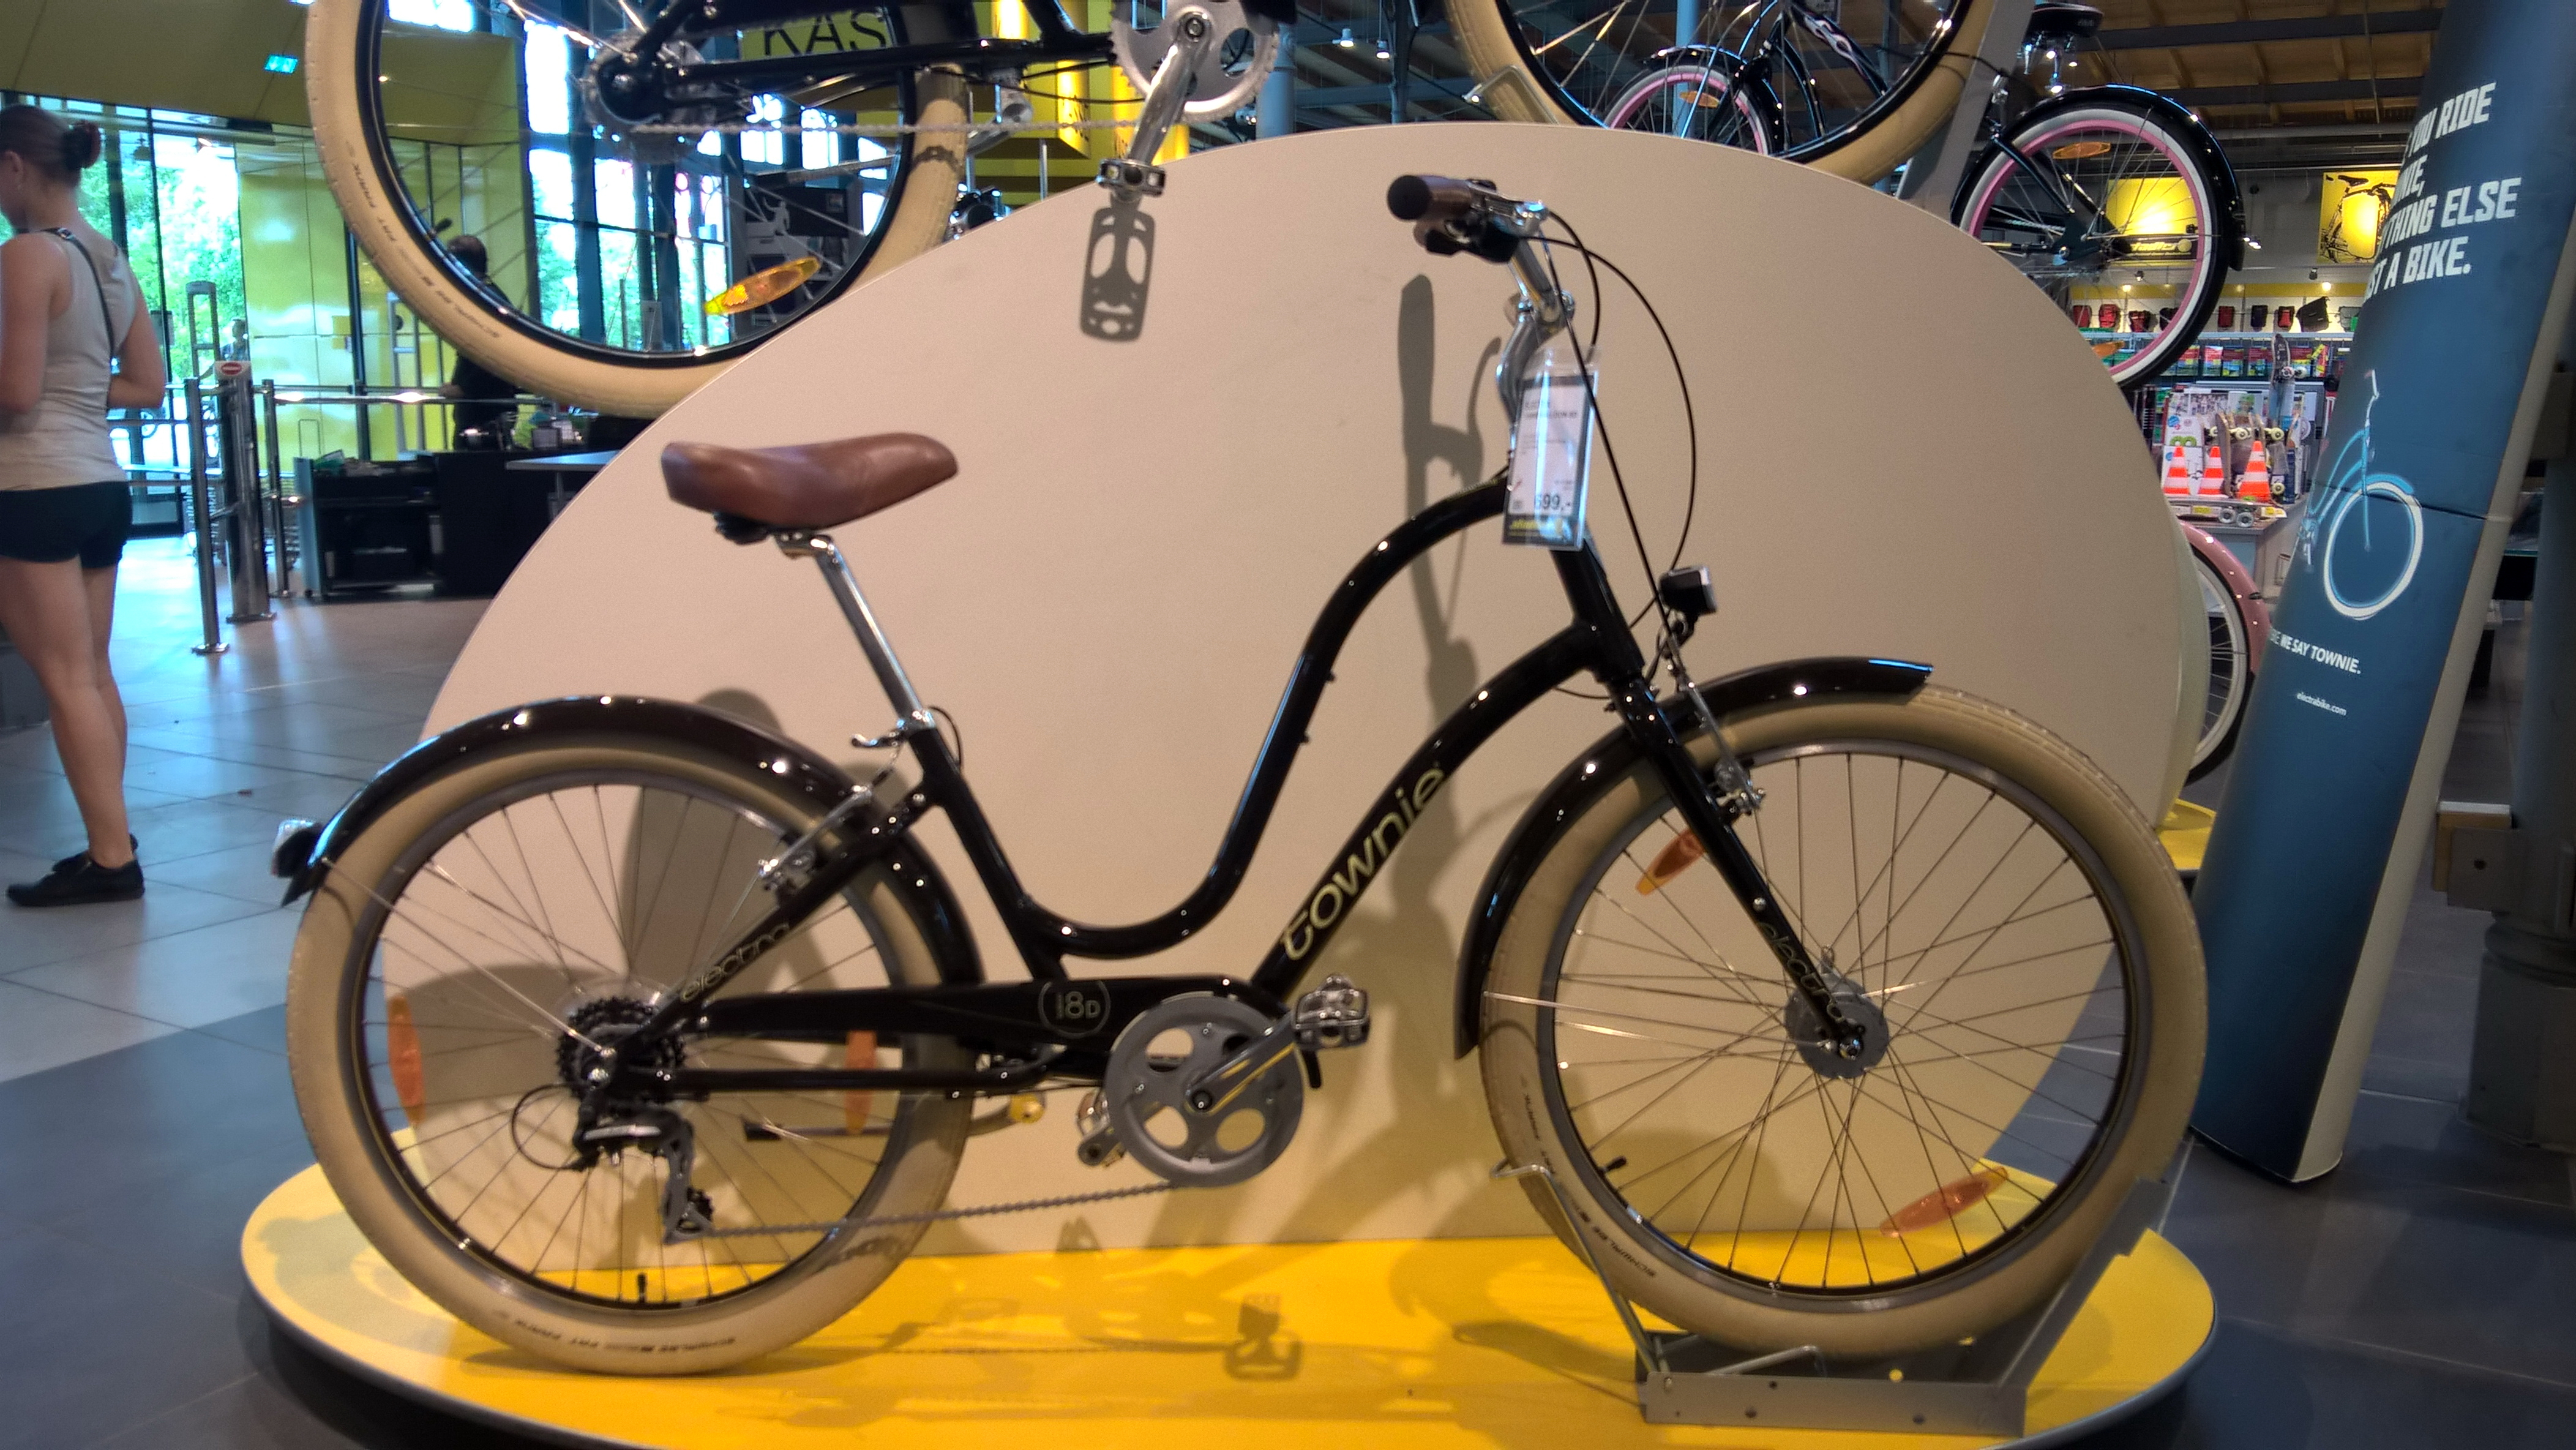 16-07-20-Electra-Bike-WP 20160711 14 45 47 Pro.jpg